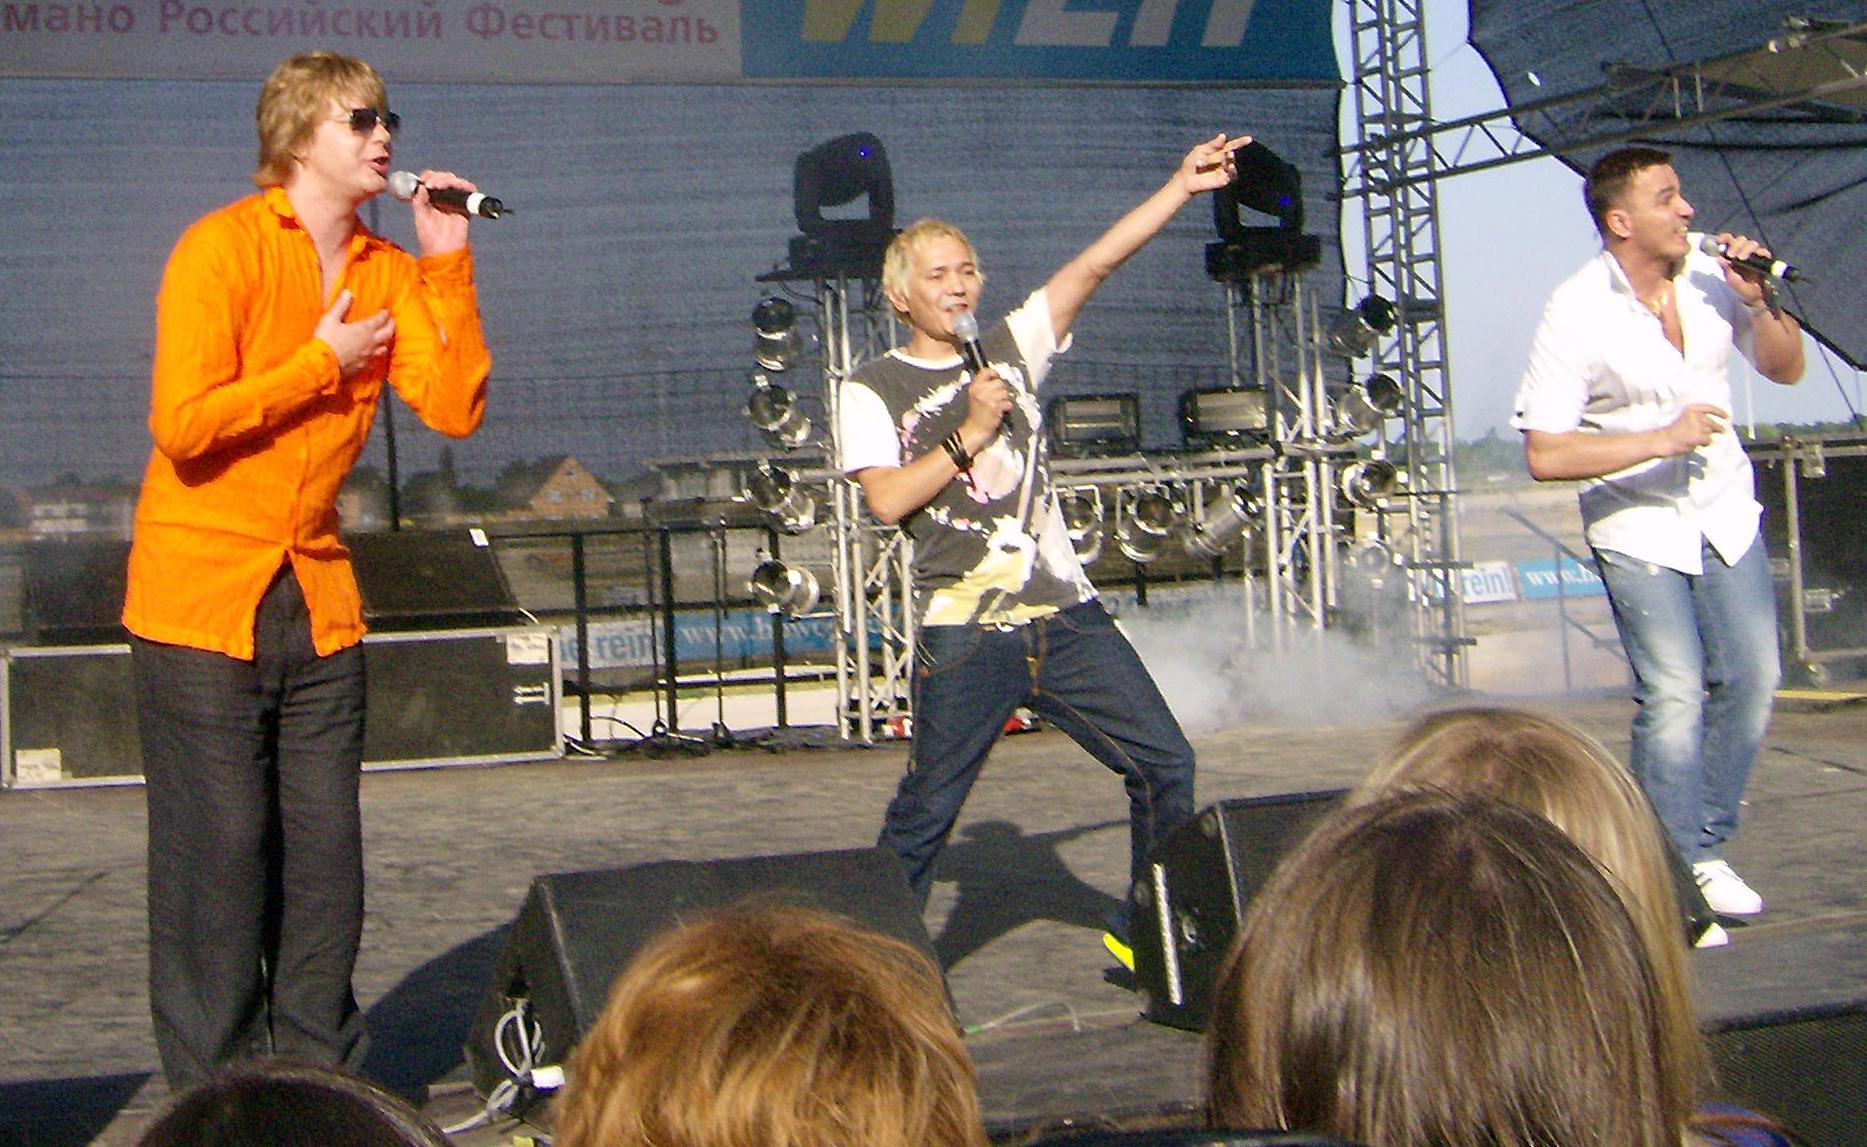 Kirill Turichenko: biography of a new member of the group Ivanushki International